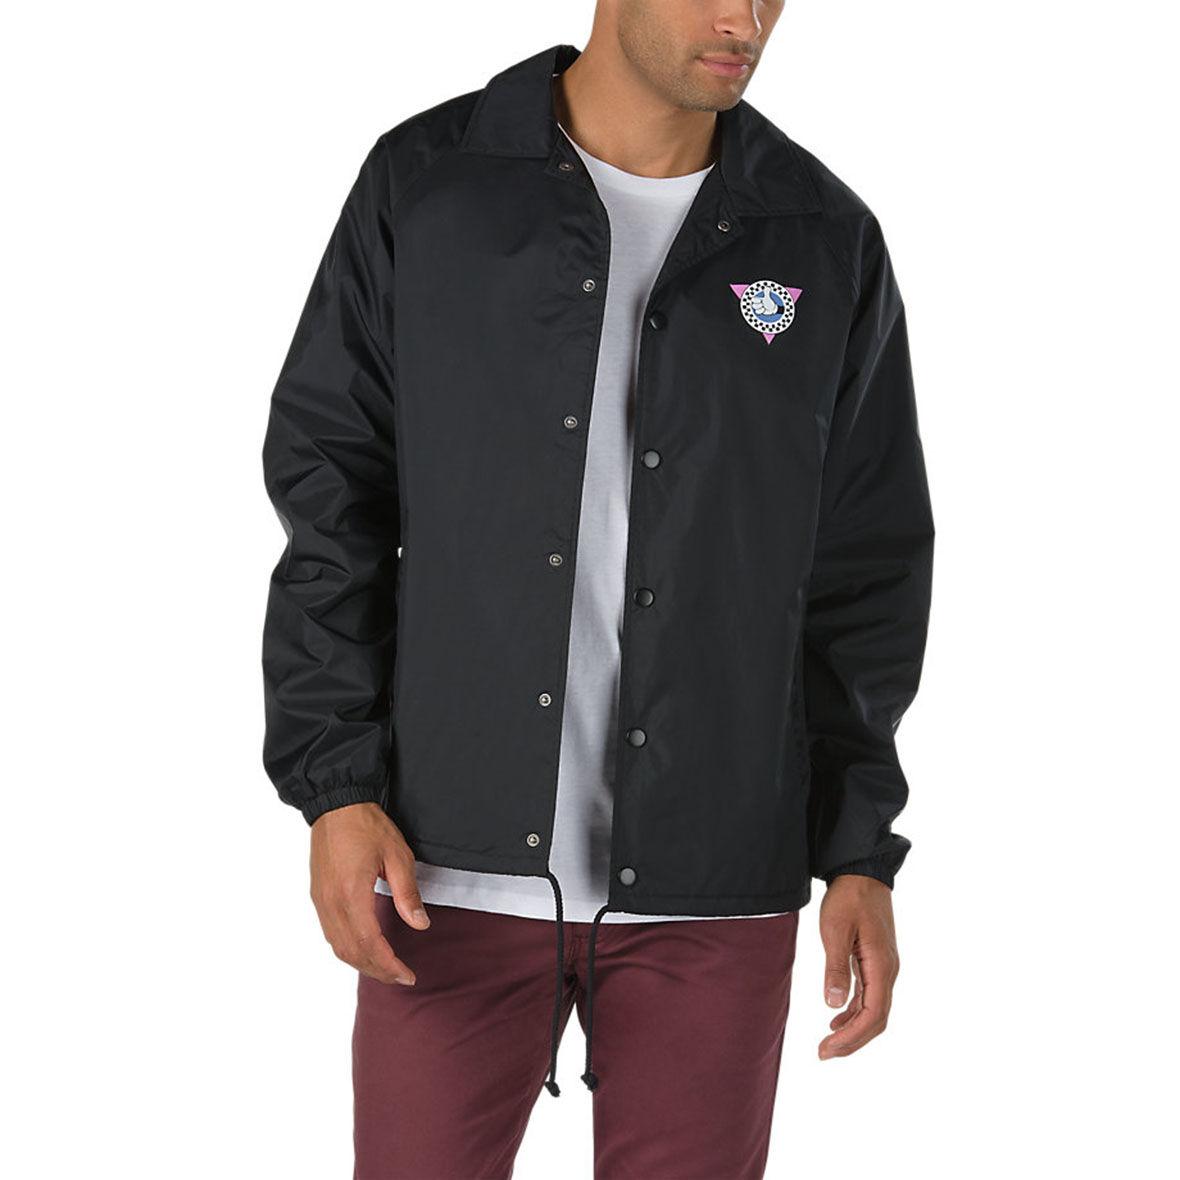 Vans X Disney Mickey Mouse Torrey Windbreaker Men Button Black Jacket Medium New Men's Clothing